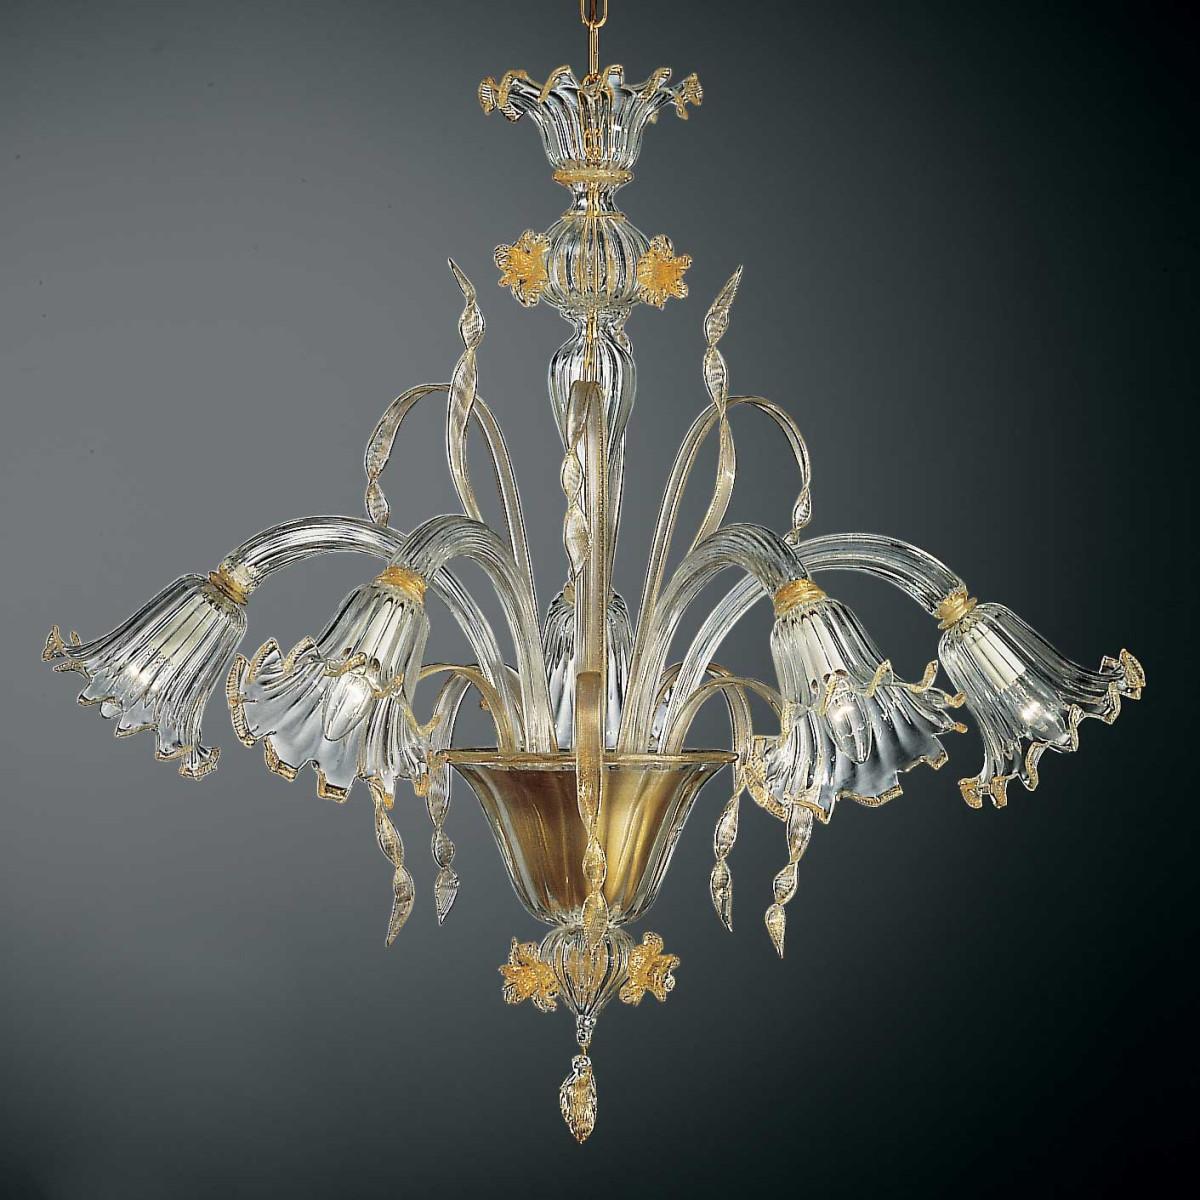 Mori 5 luces lampara de Murano - color transparente oro